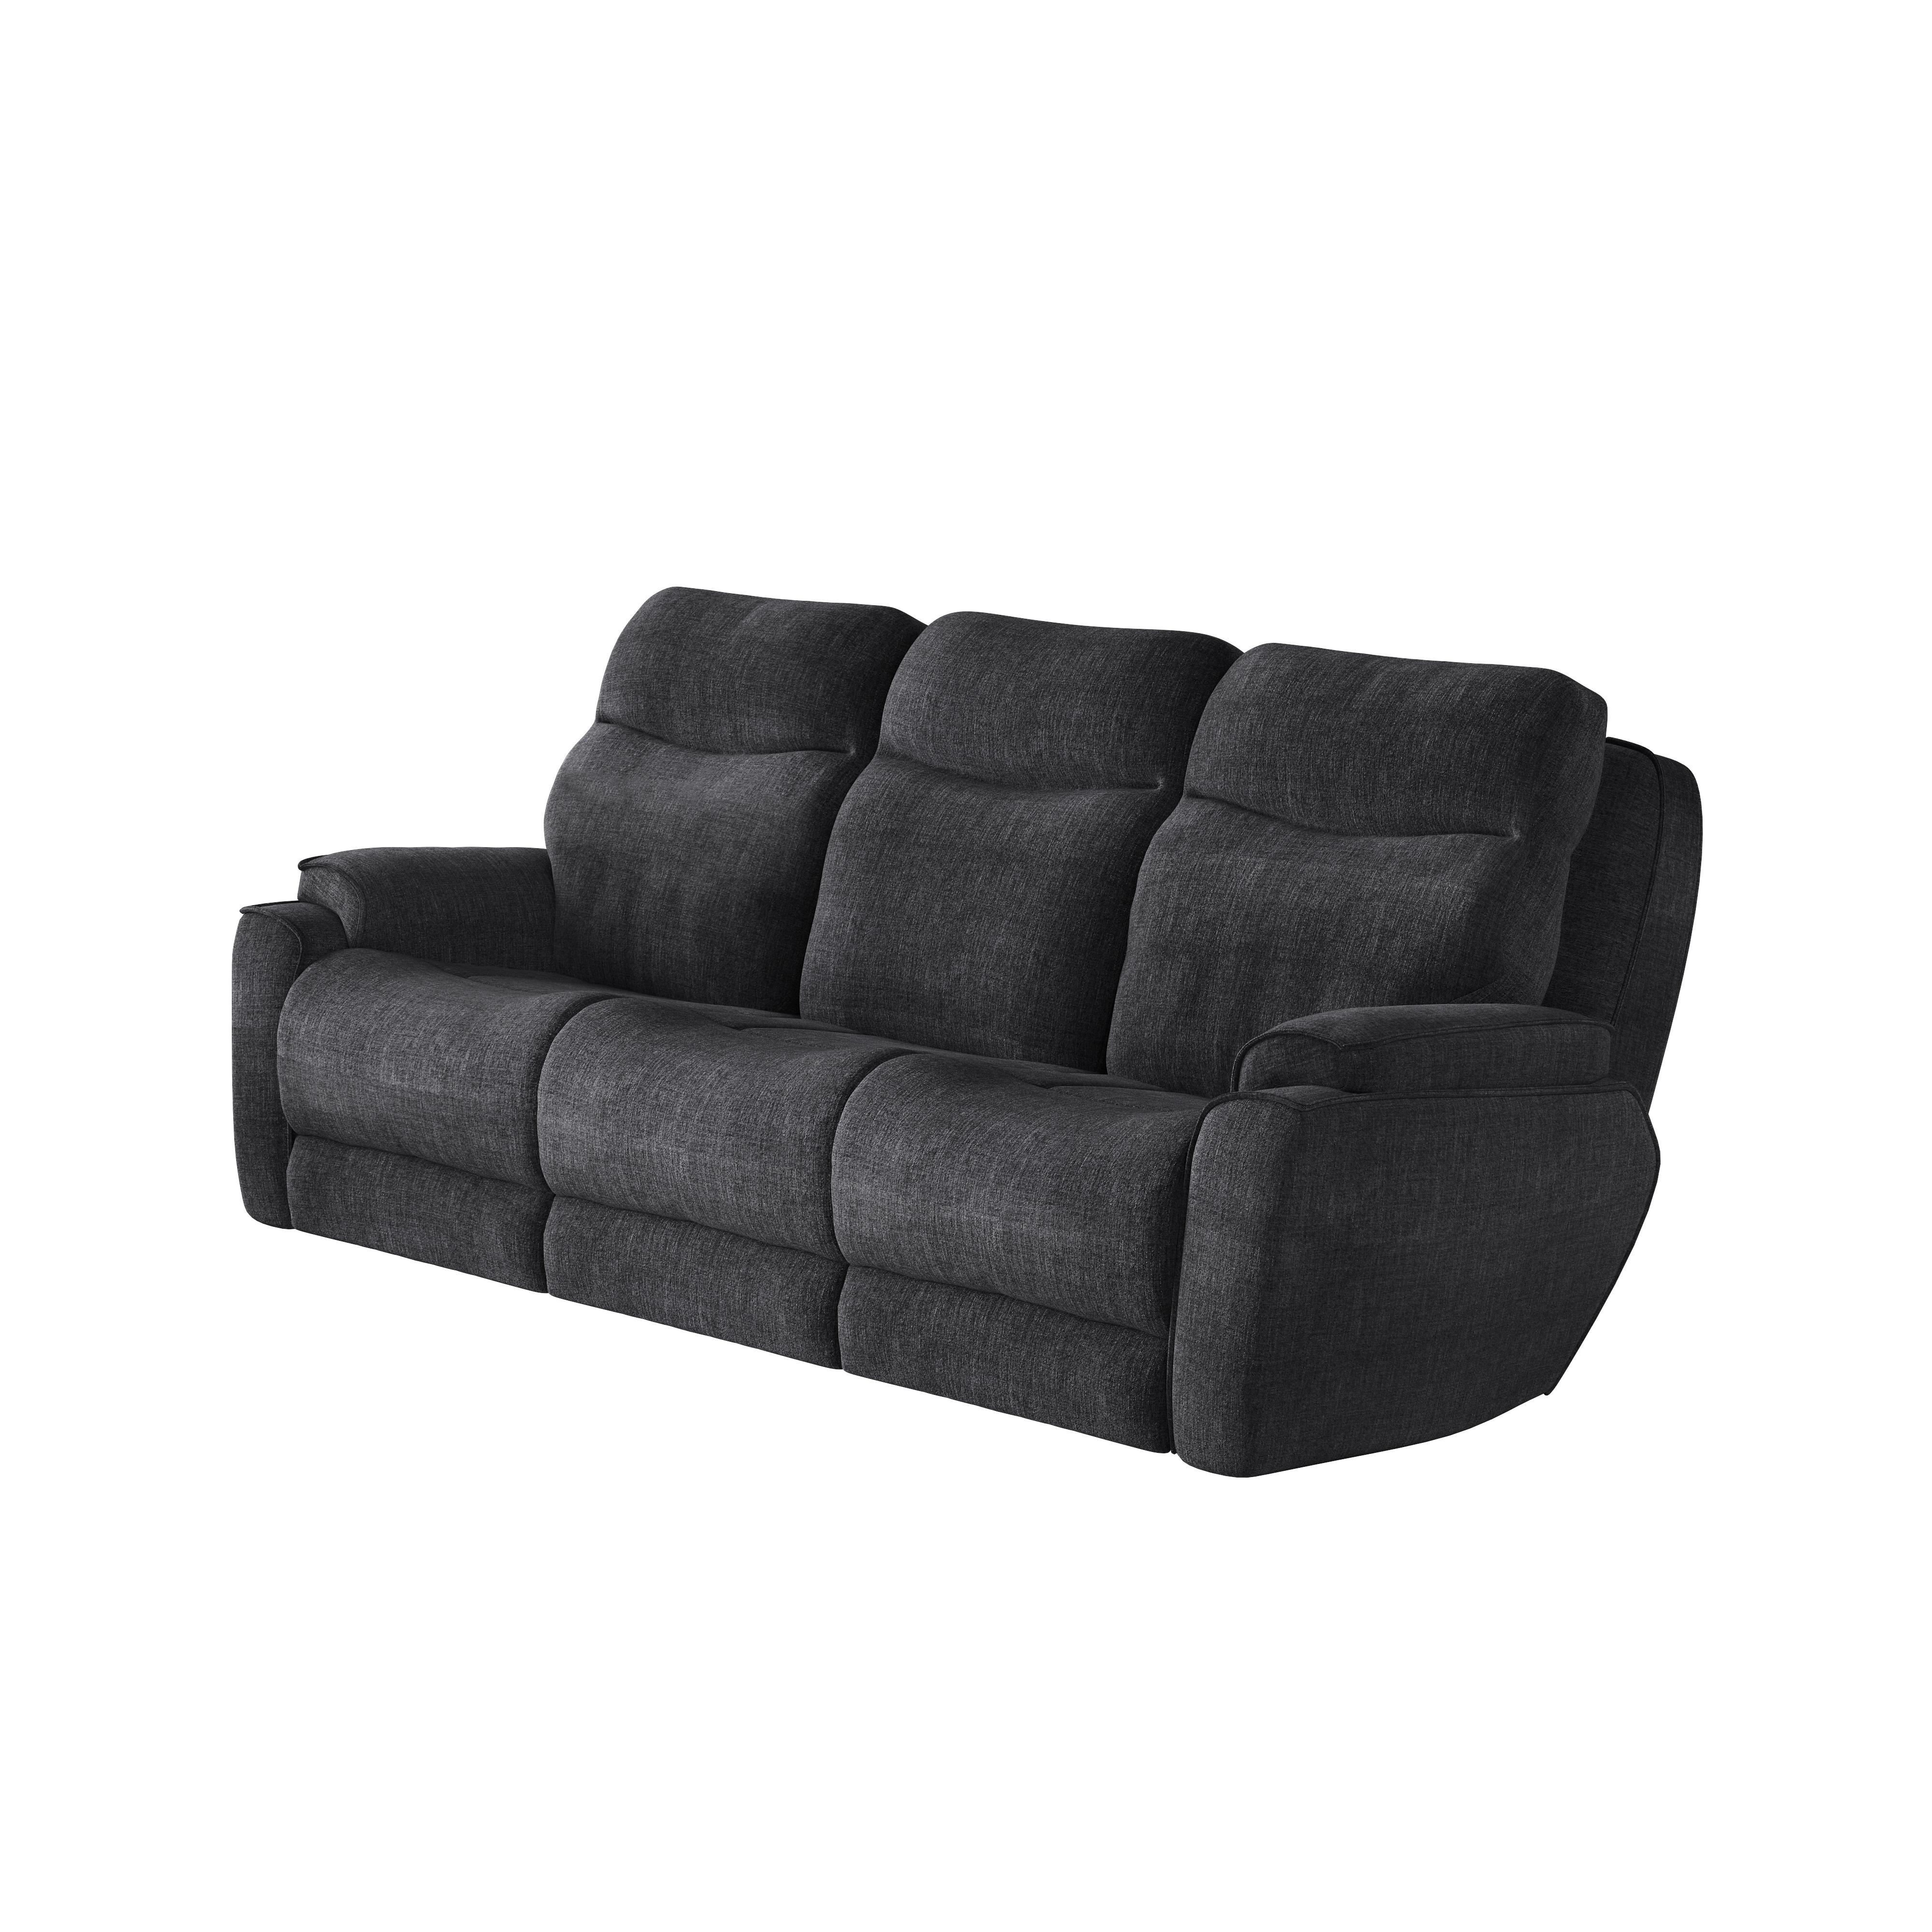 Bahari-Charcoal-sofa